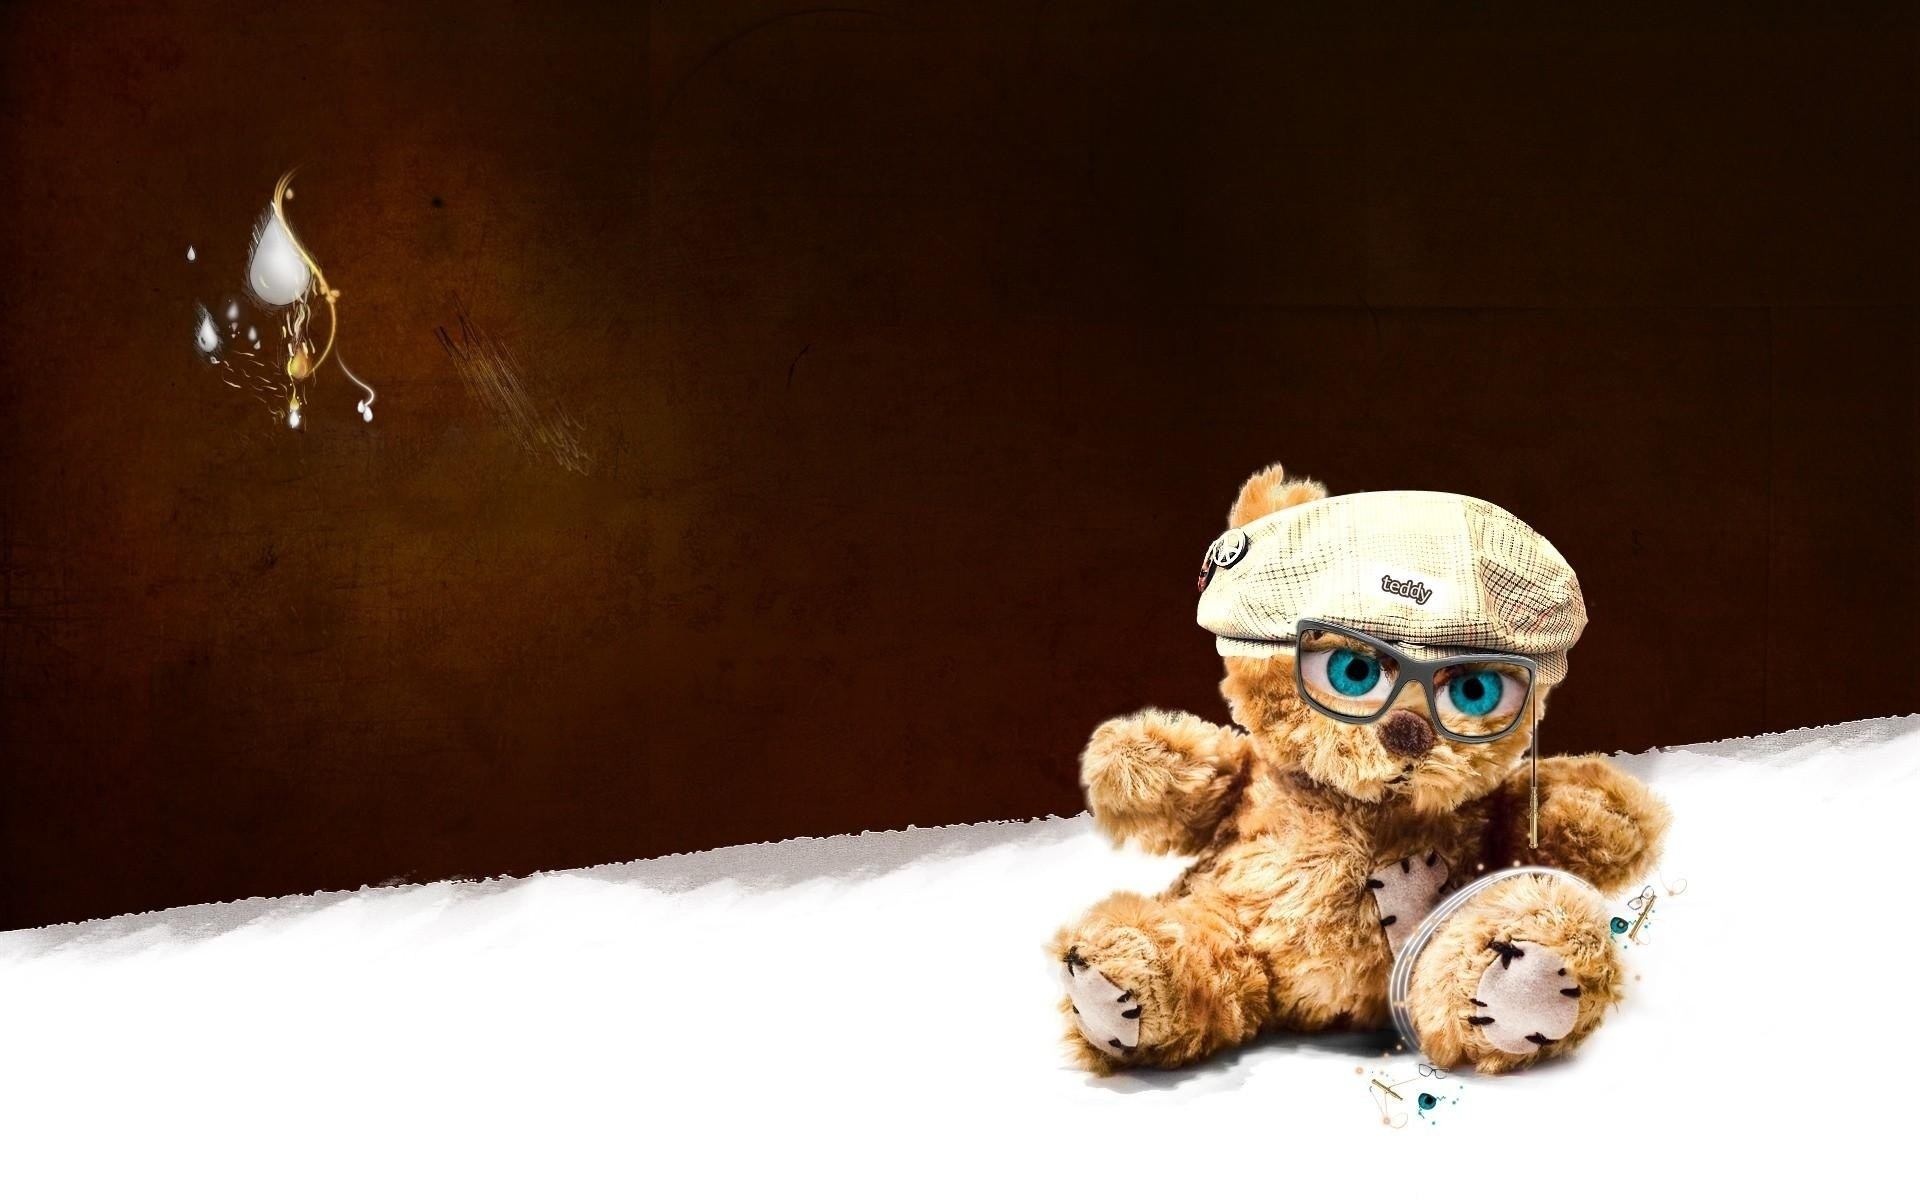 Free Wallpapers Of Cute Teddy Bears Cute Teddy Bears Wallpapers 59 Images